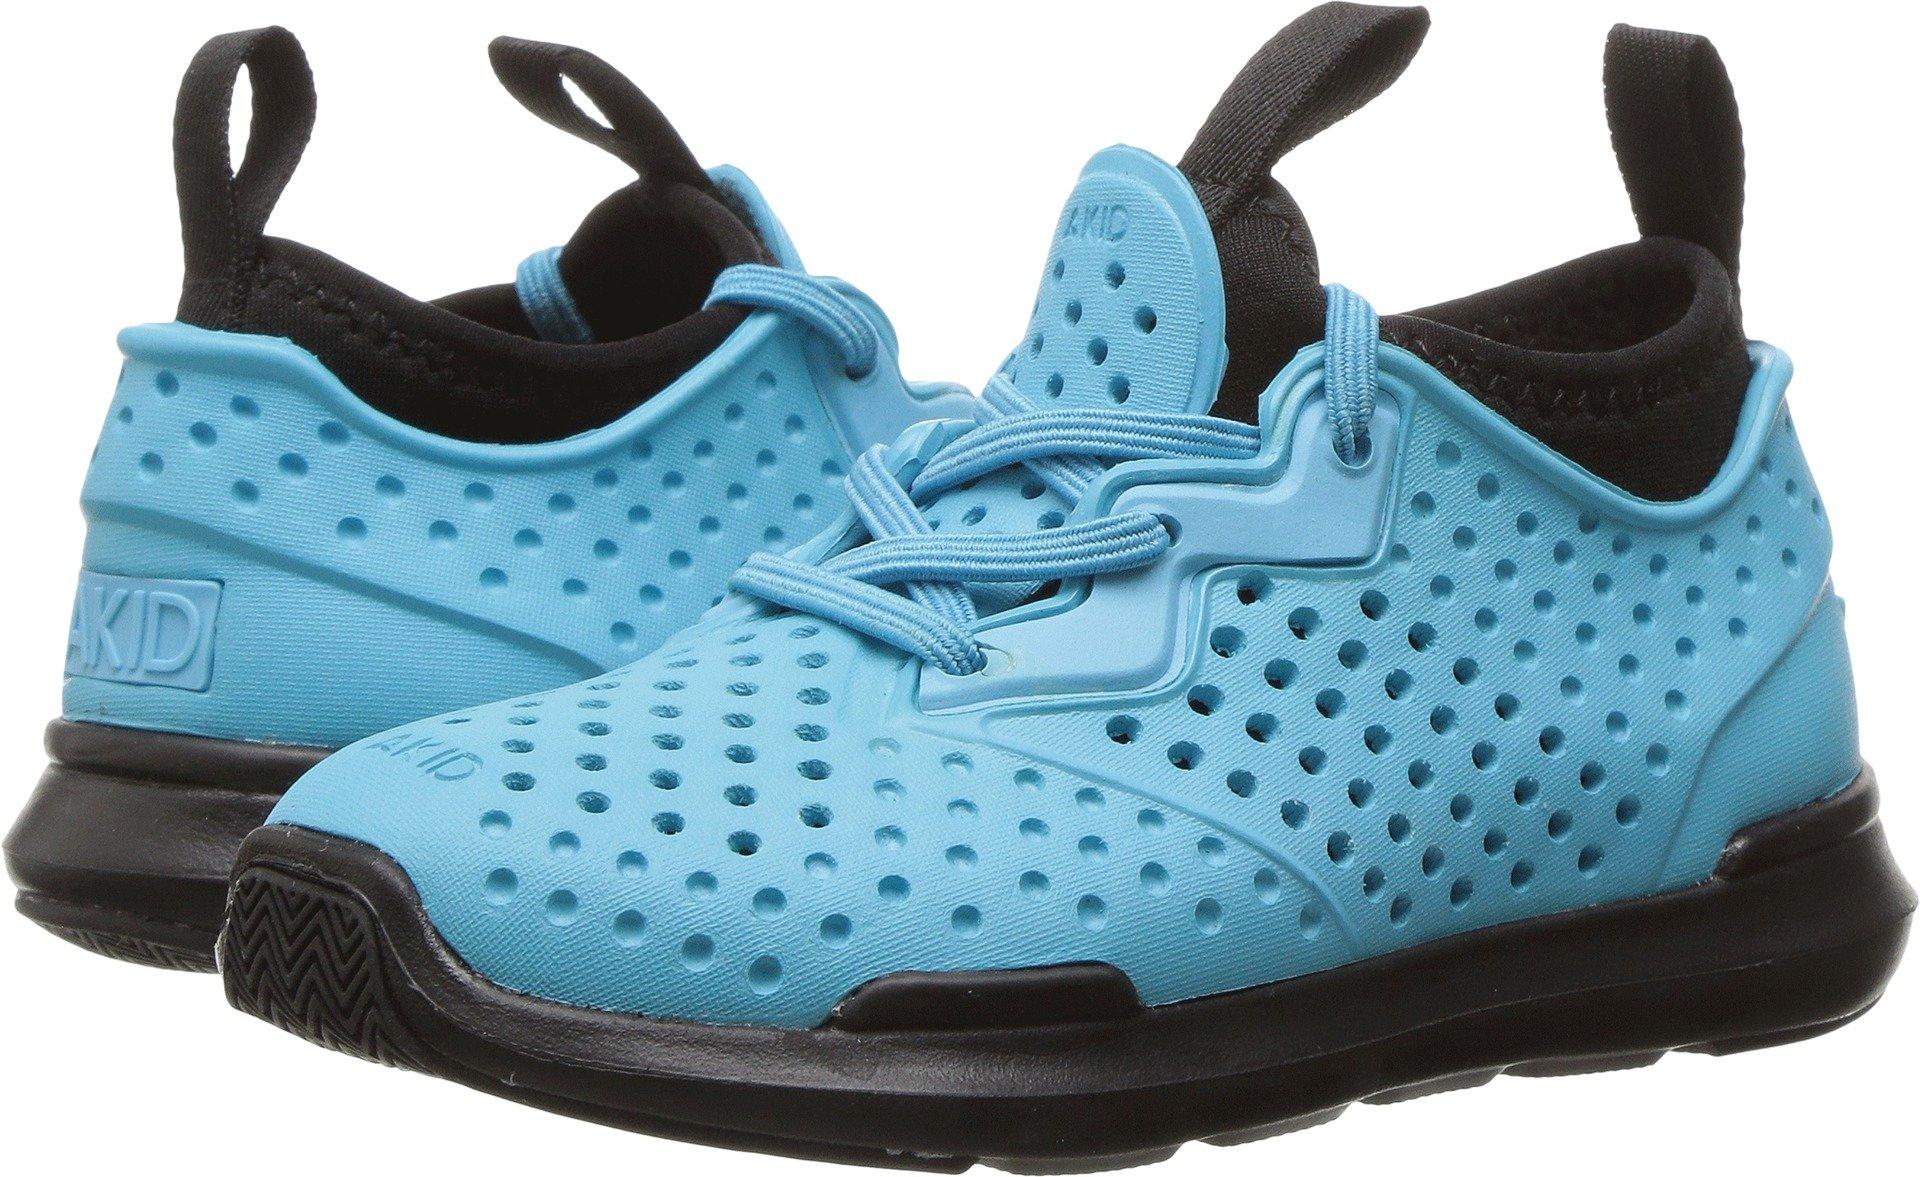 AKID Brand Unisex Chase (Toddler/Little Kid/Big Kid) Bright Blue/Black Athletic Shoe